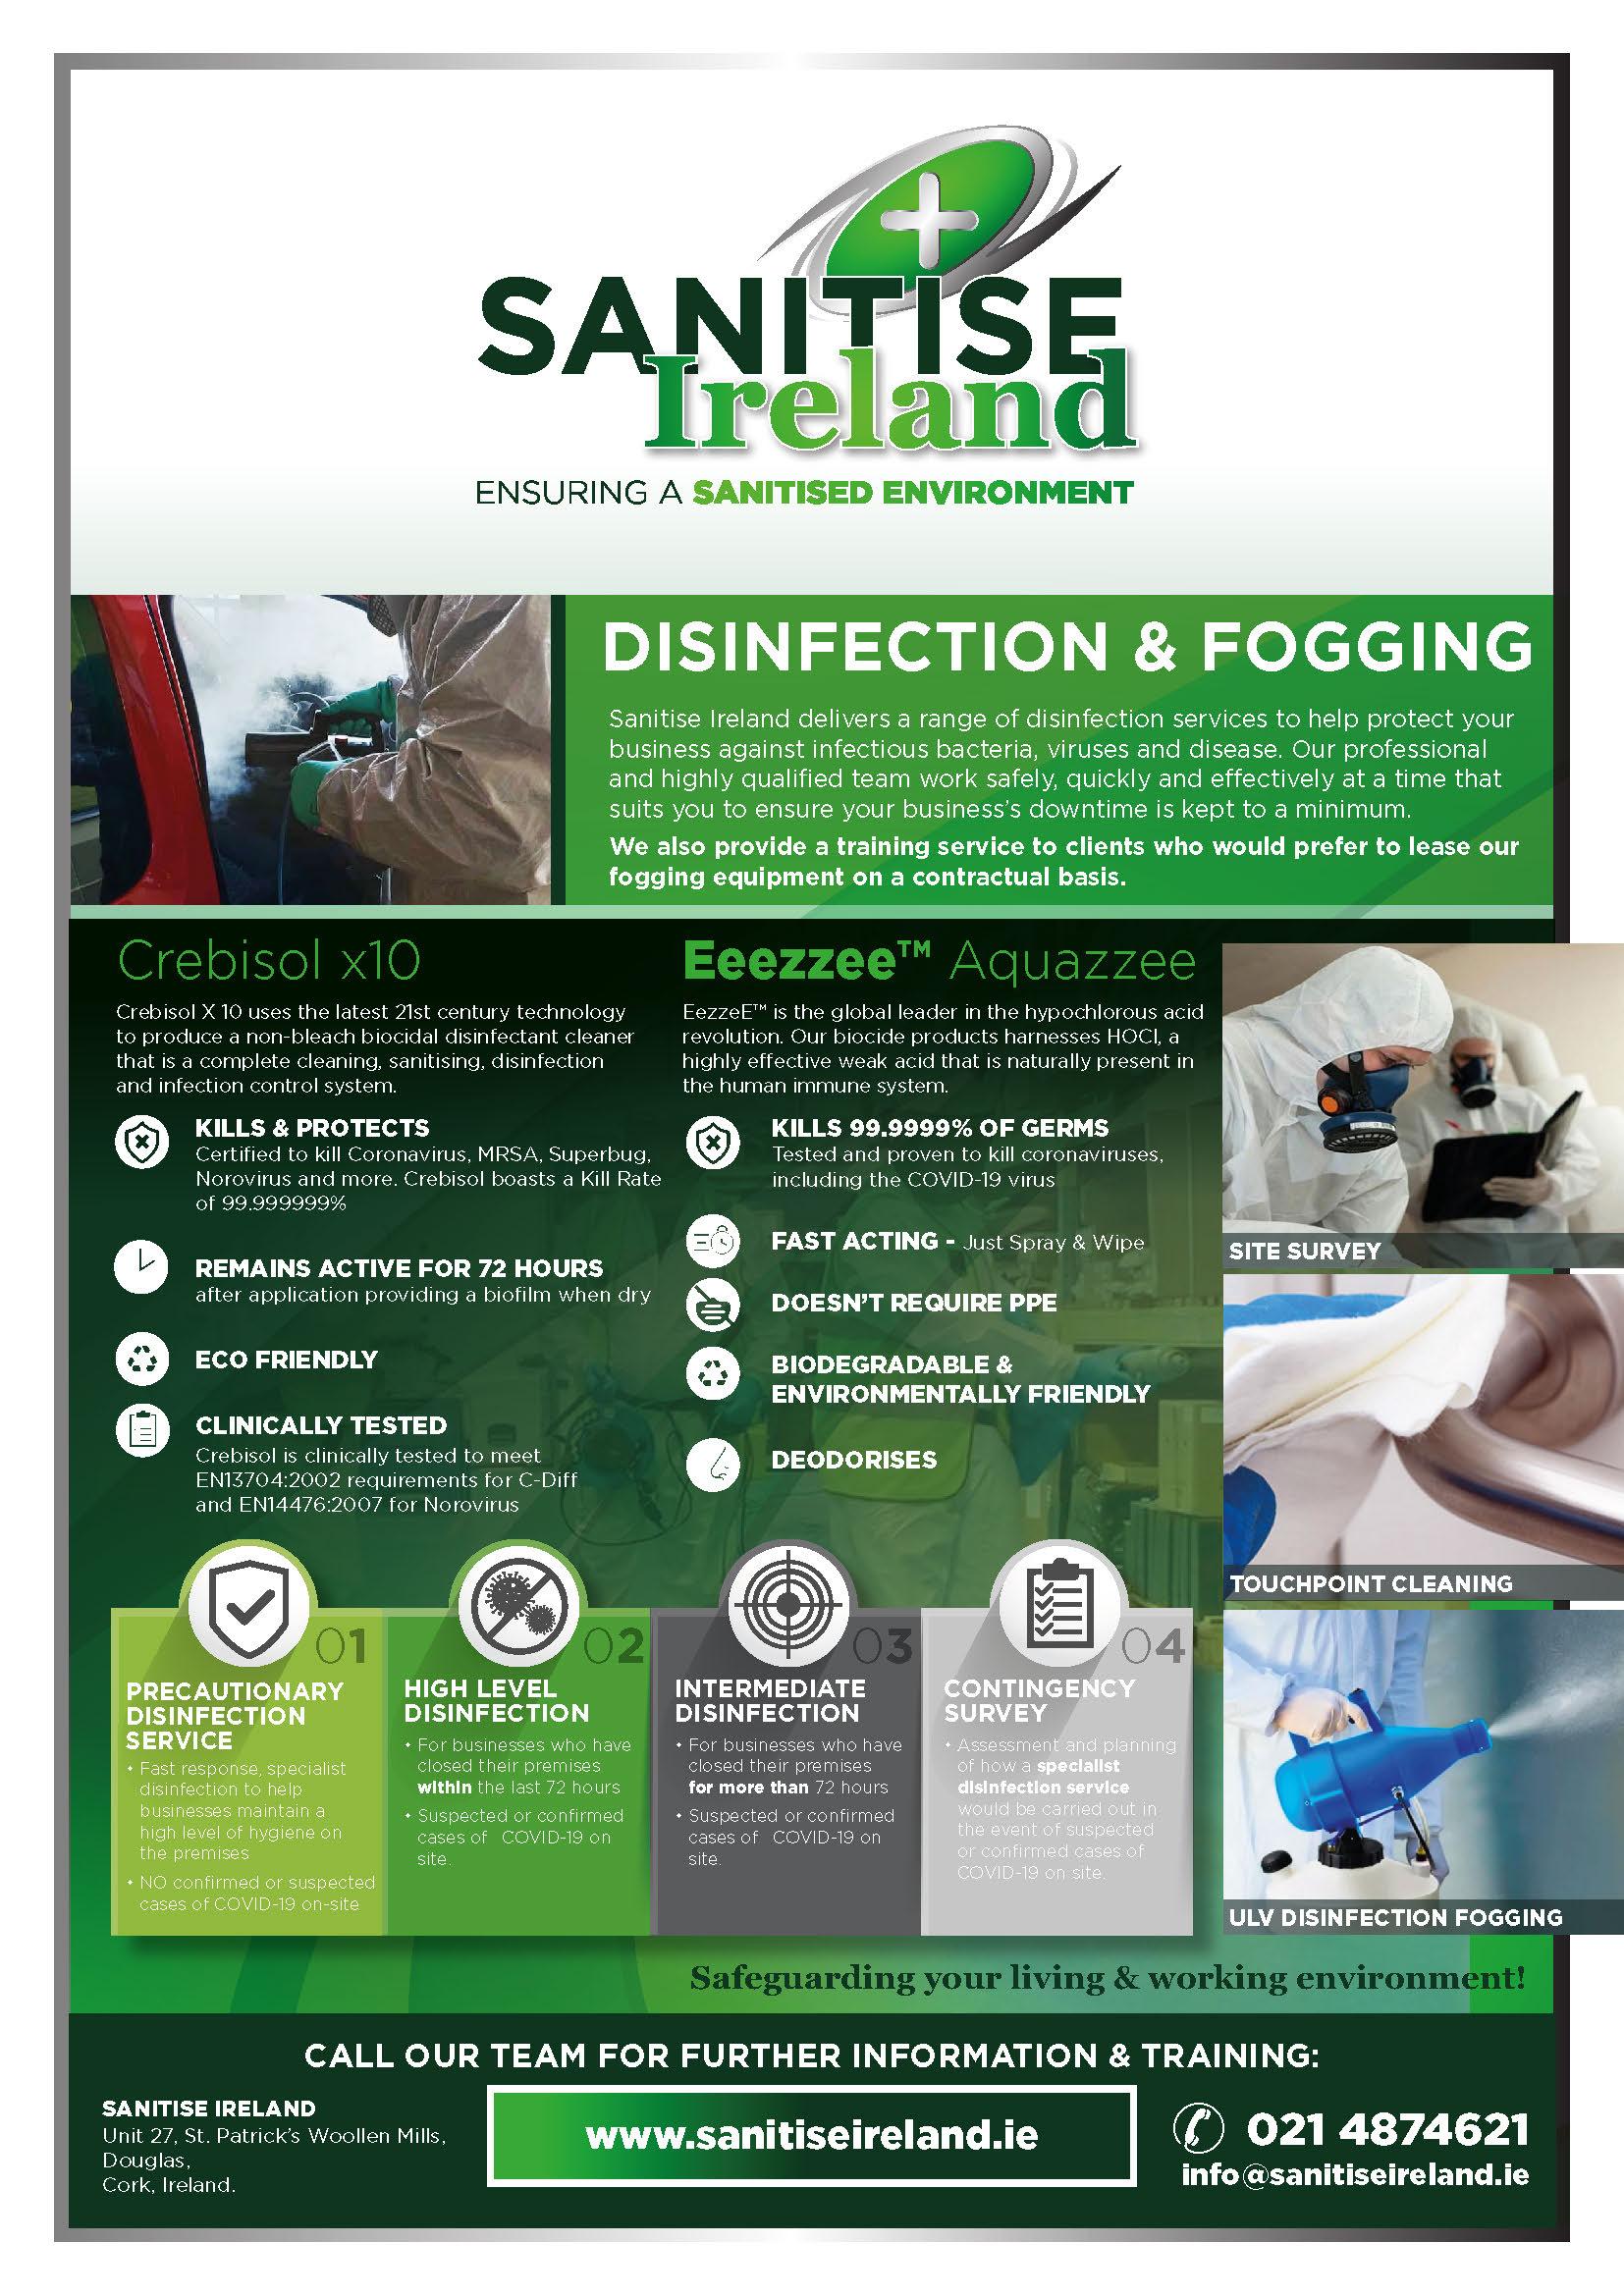 Santise Ireland - Fogging & Services